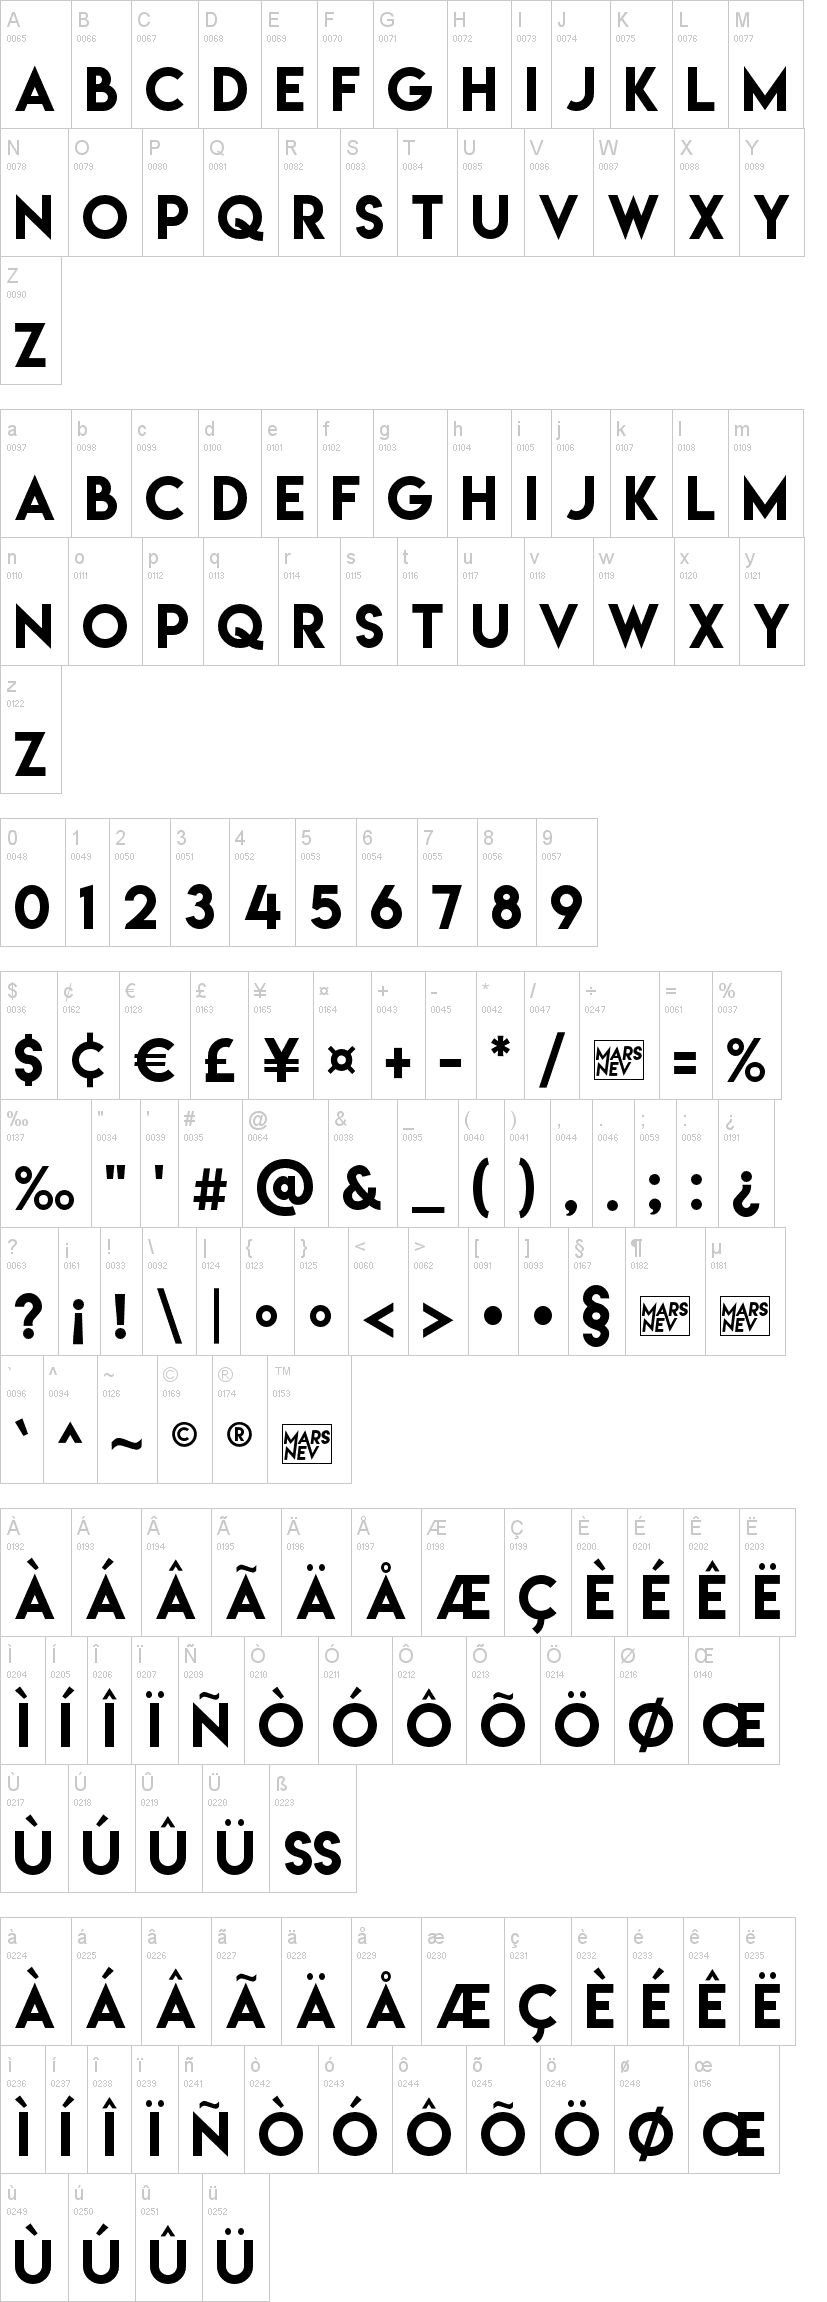 Lemon/Milk Font | dafont com